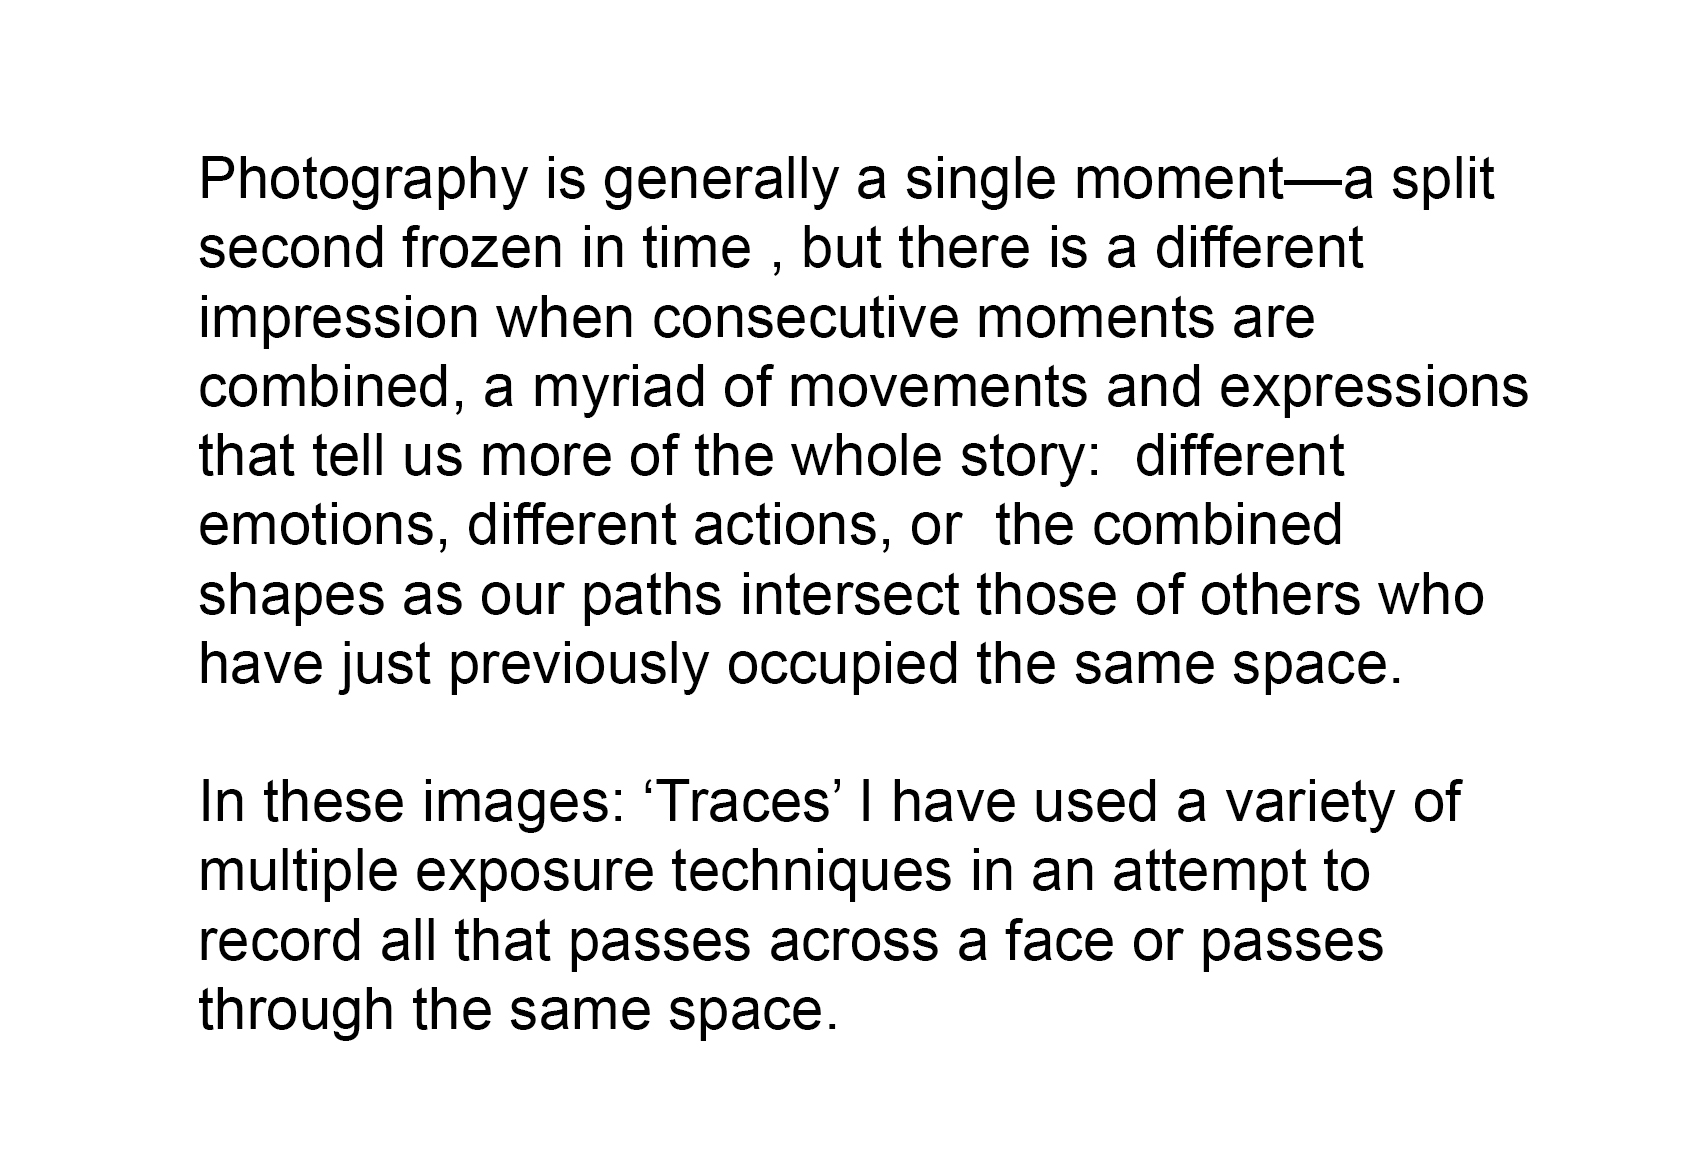 Traces explanation